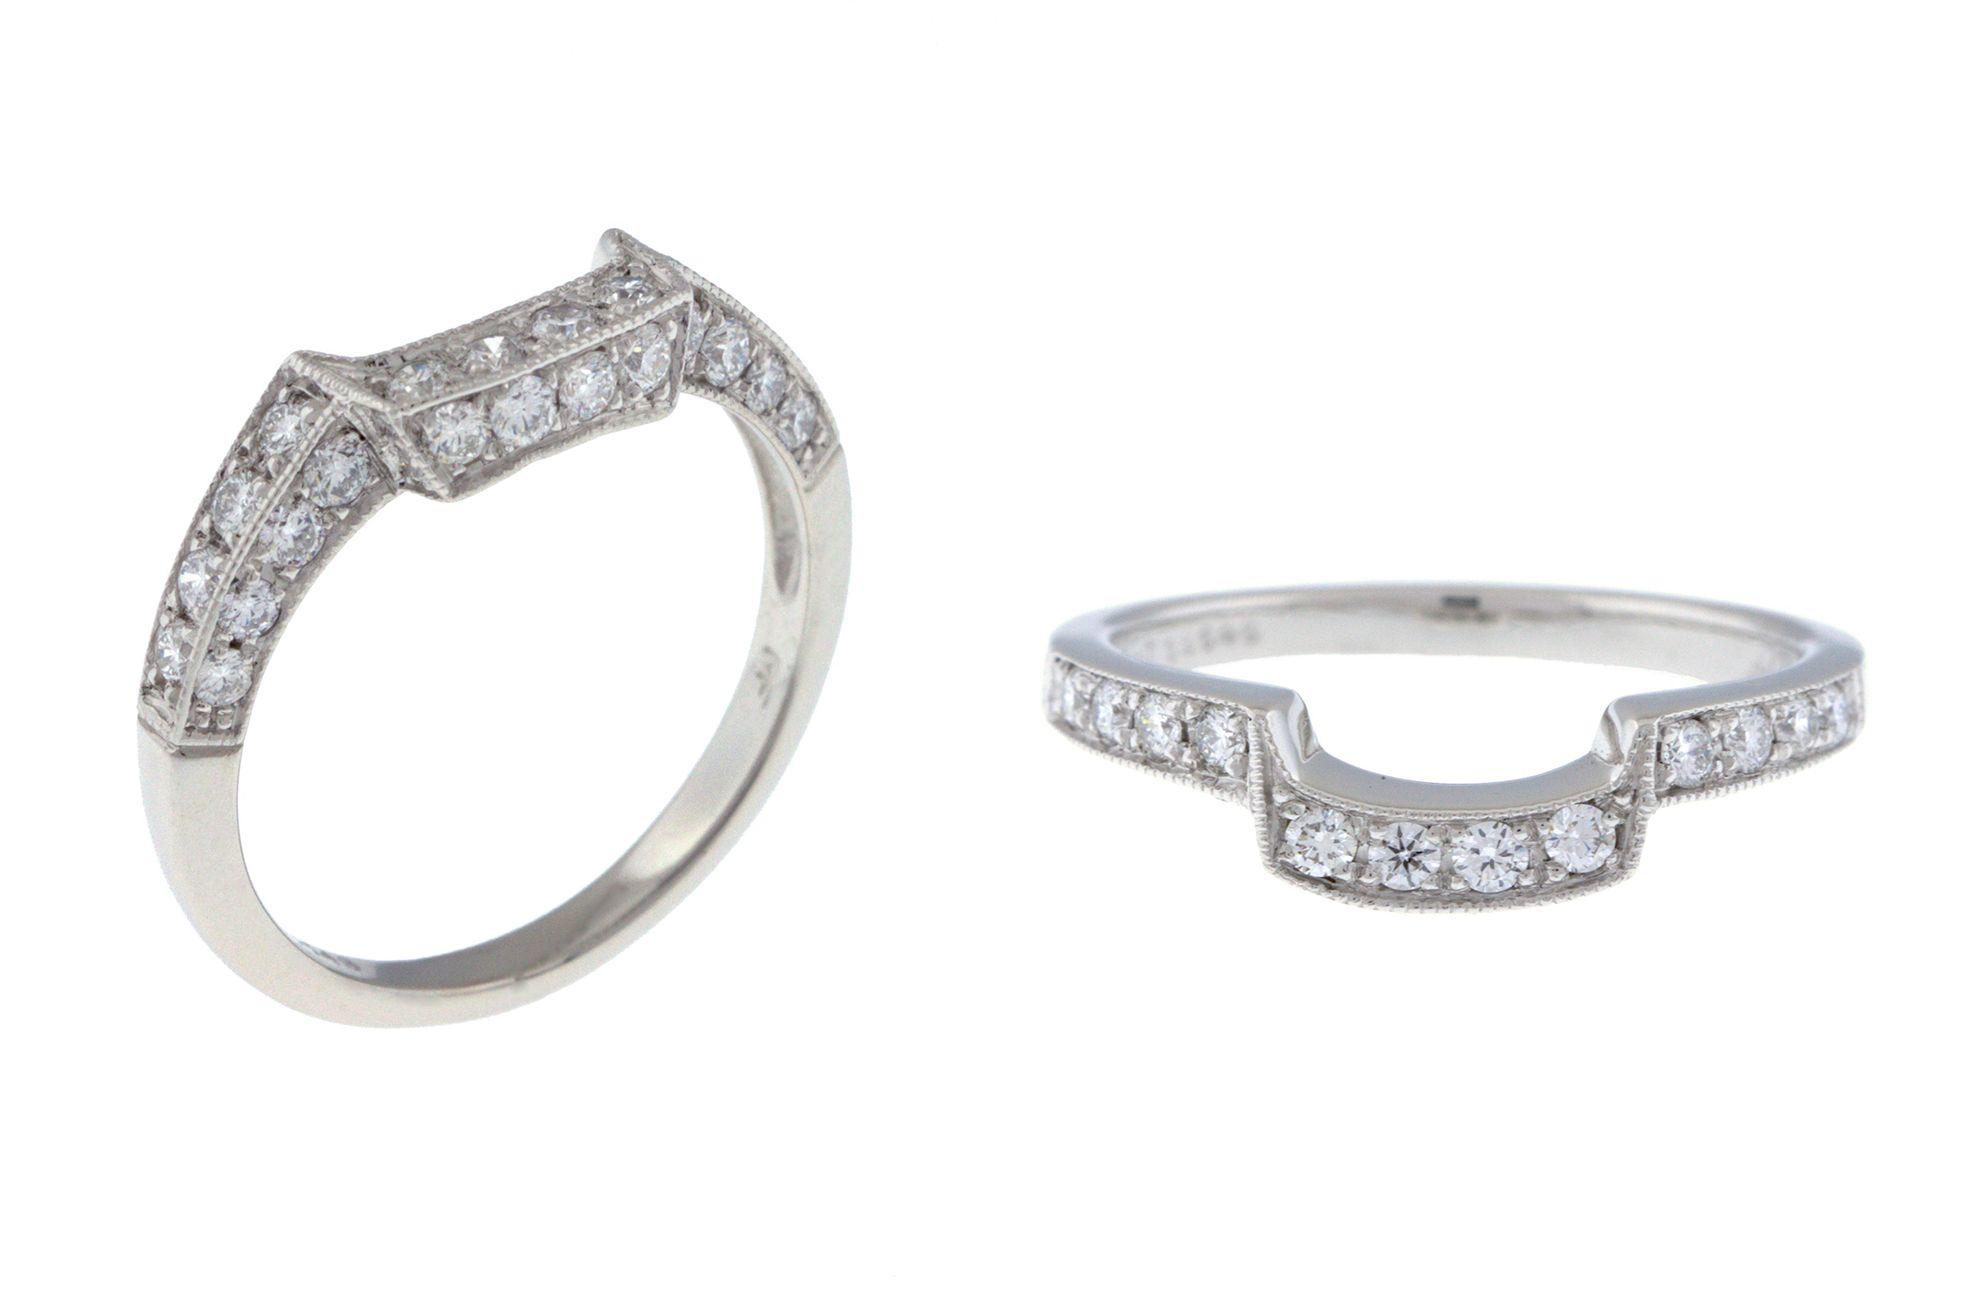 #customband #platinum #platinumring #curveddiamondband #diamondweddingband